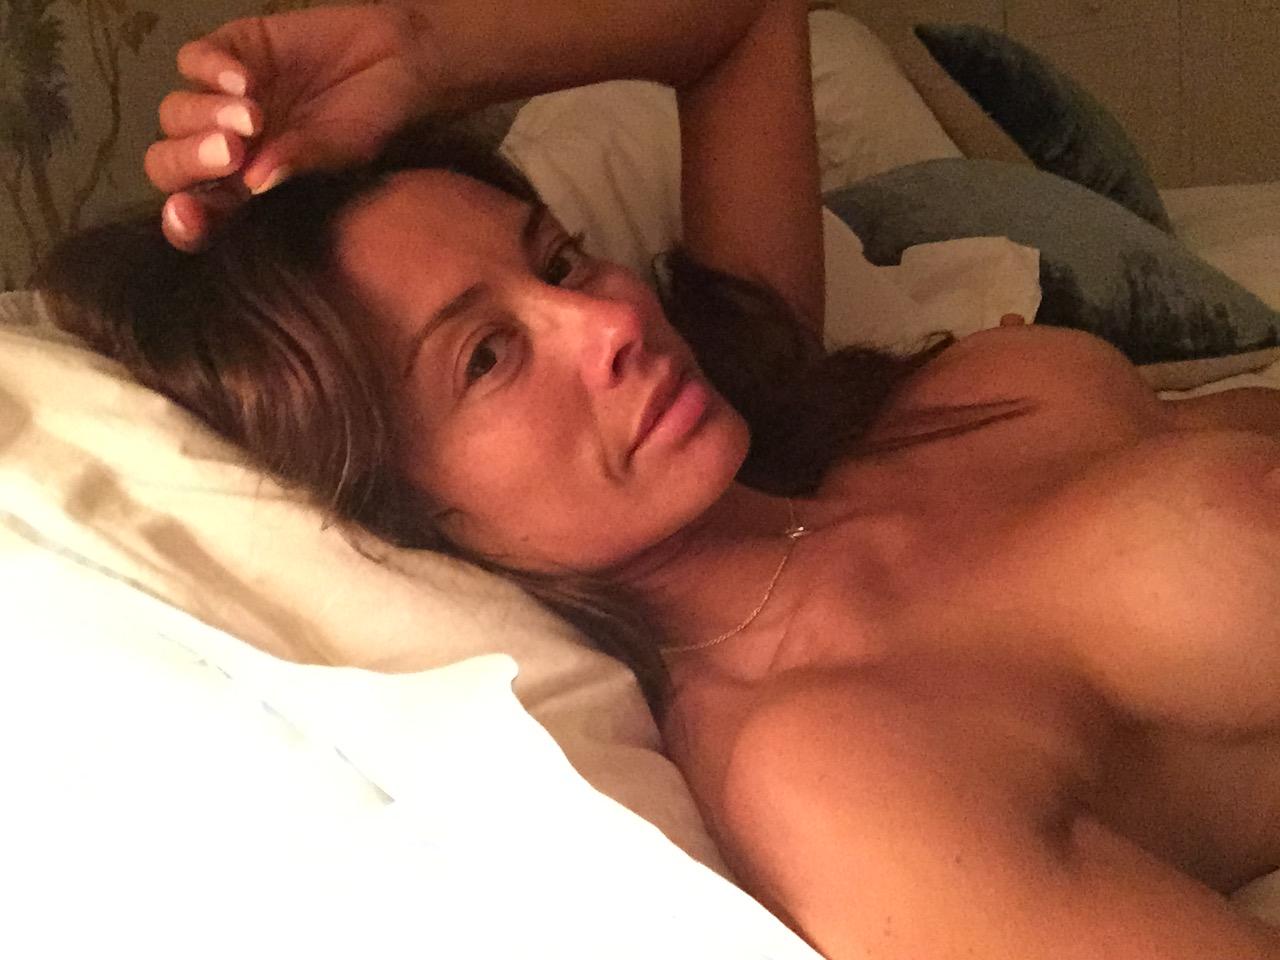 Audrey bitoni nude gallery